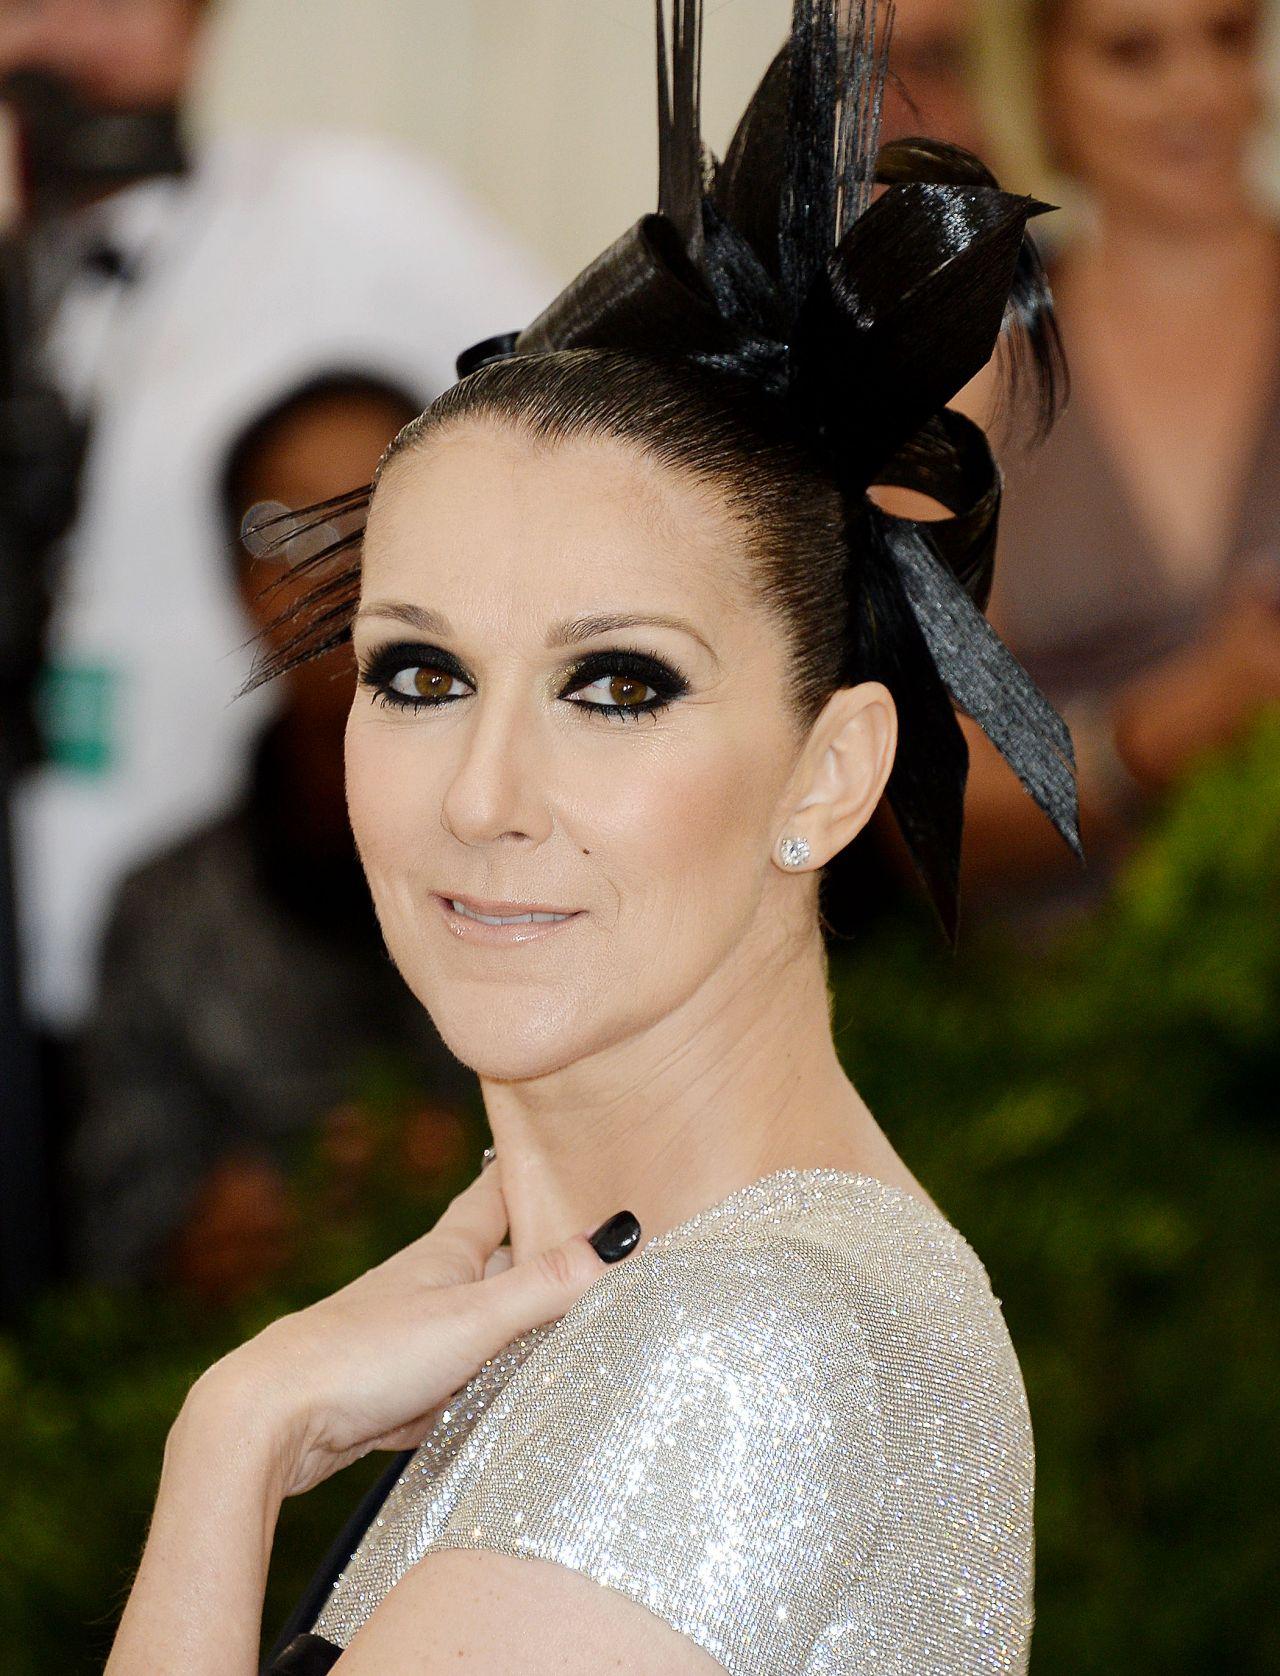 Celine Dion Style, Clothes, Outfits and Fashion • CelebMafia